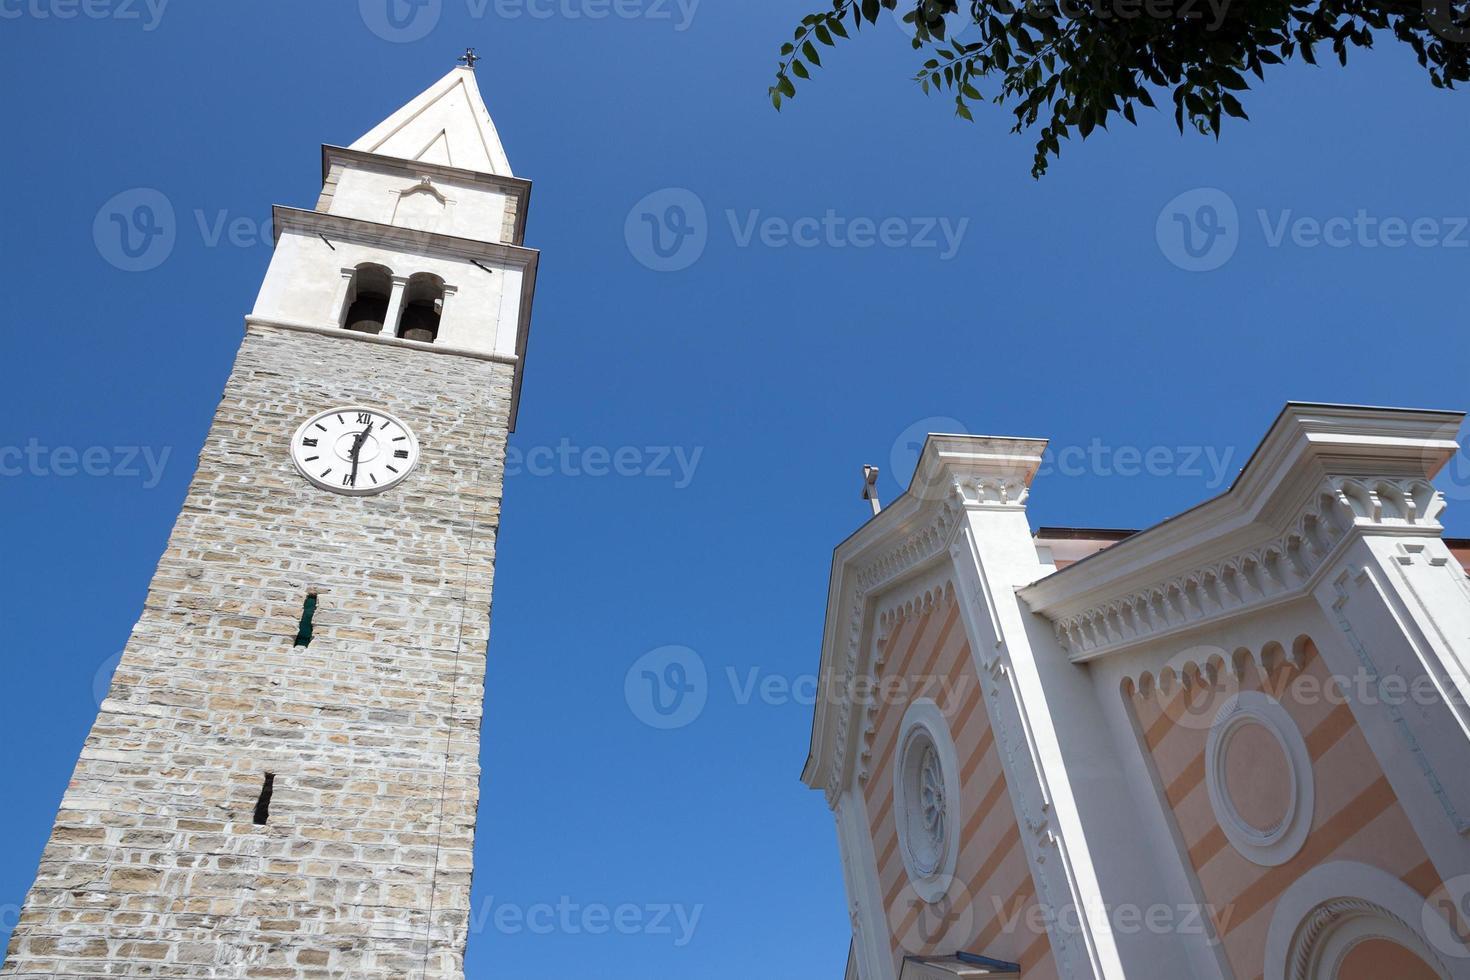 izola, el campanario e iglesia de st. maur - eslovenia foto